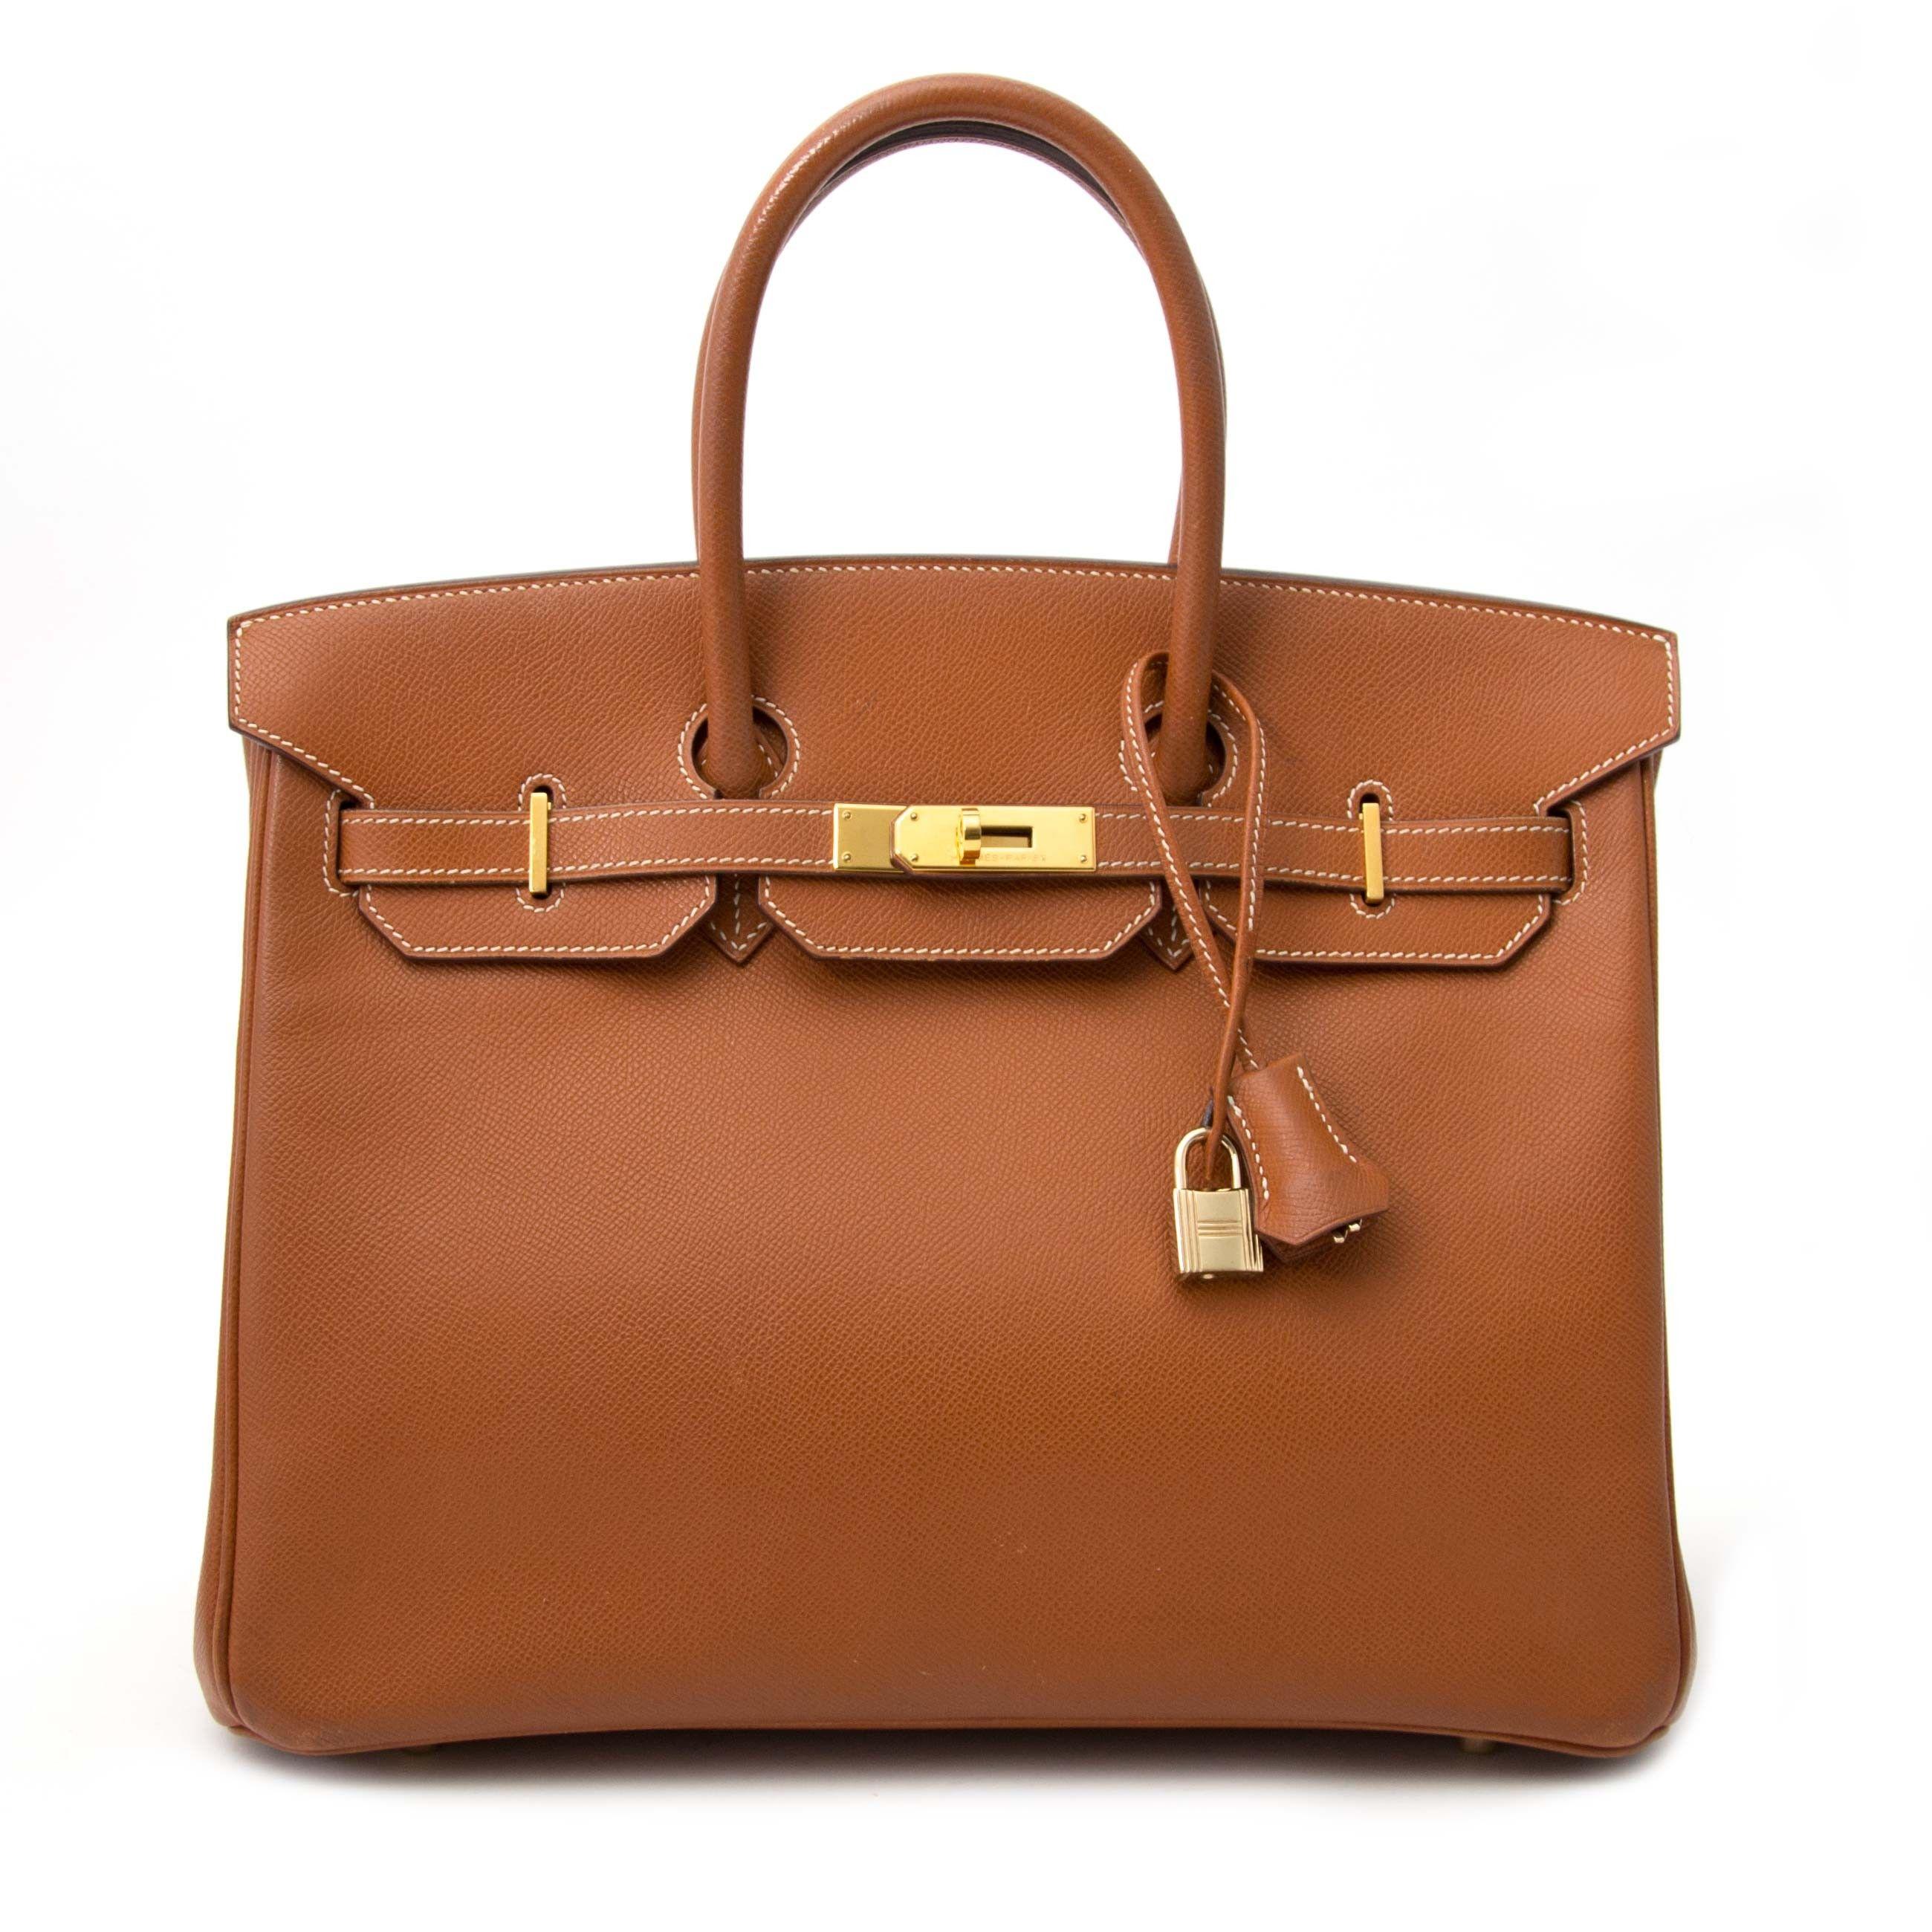 2075fc535cca8 Hermès Birkin 30 Etoupe Togo GHW for sale online at Labellov